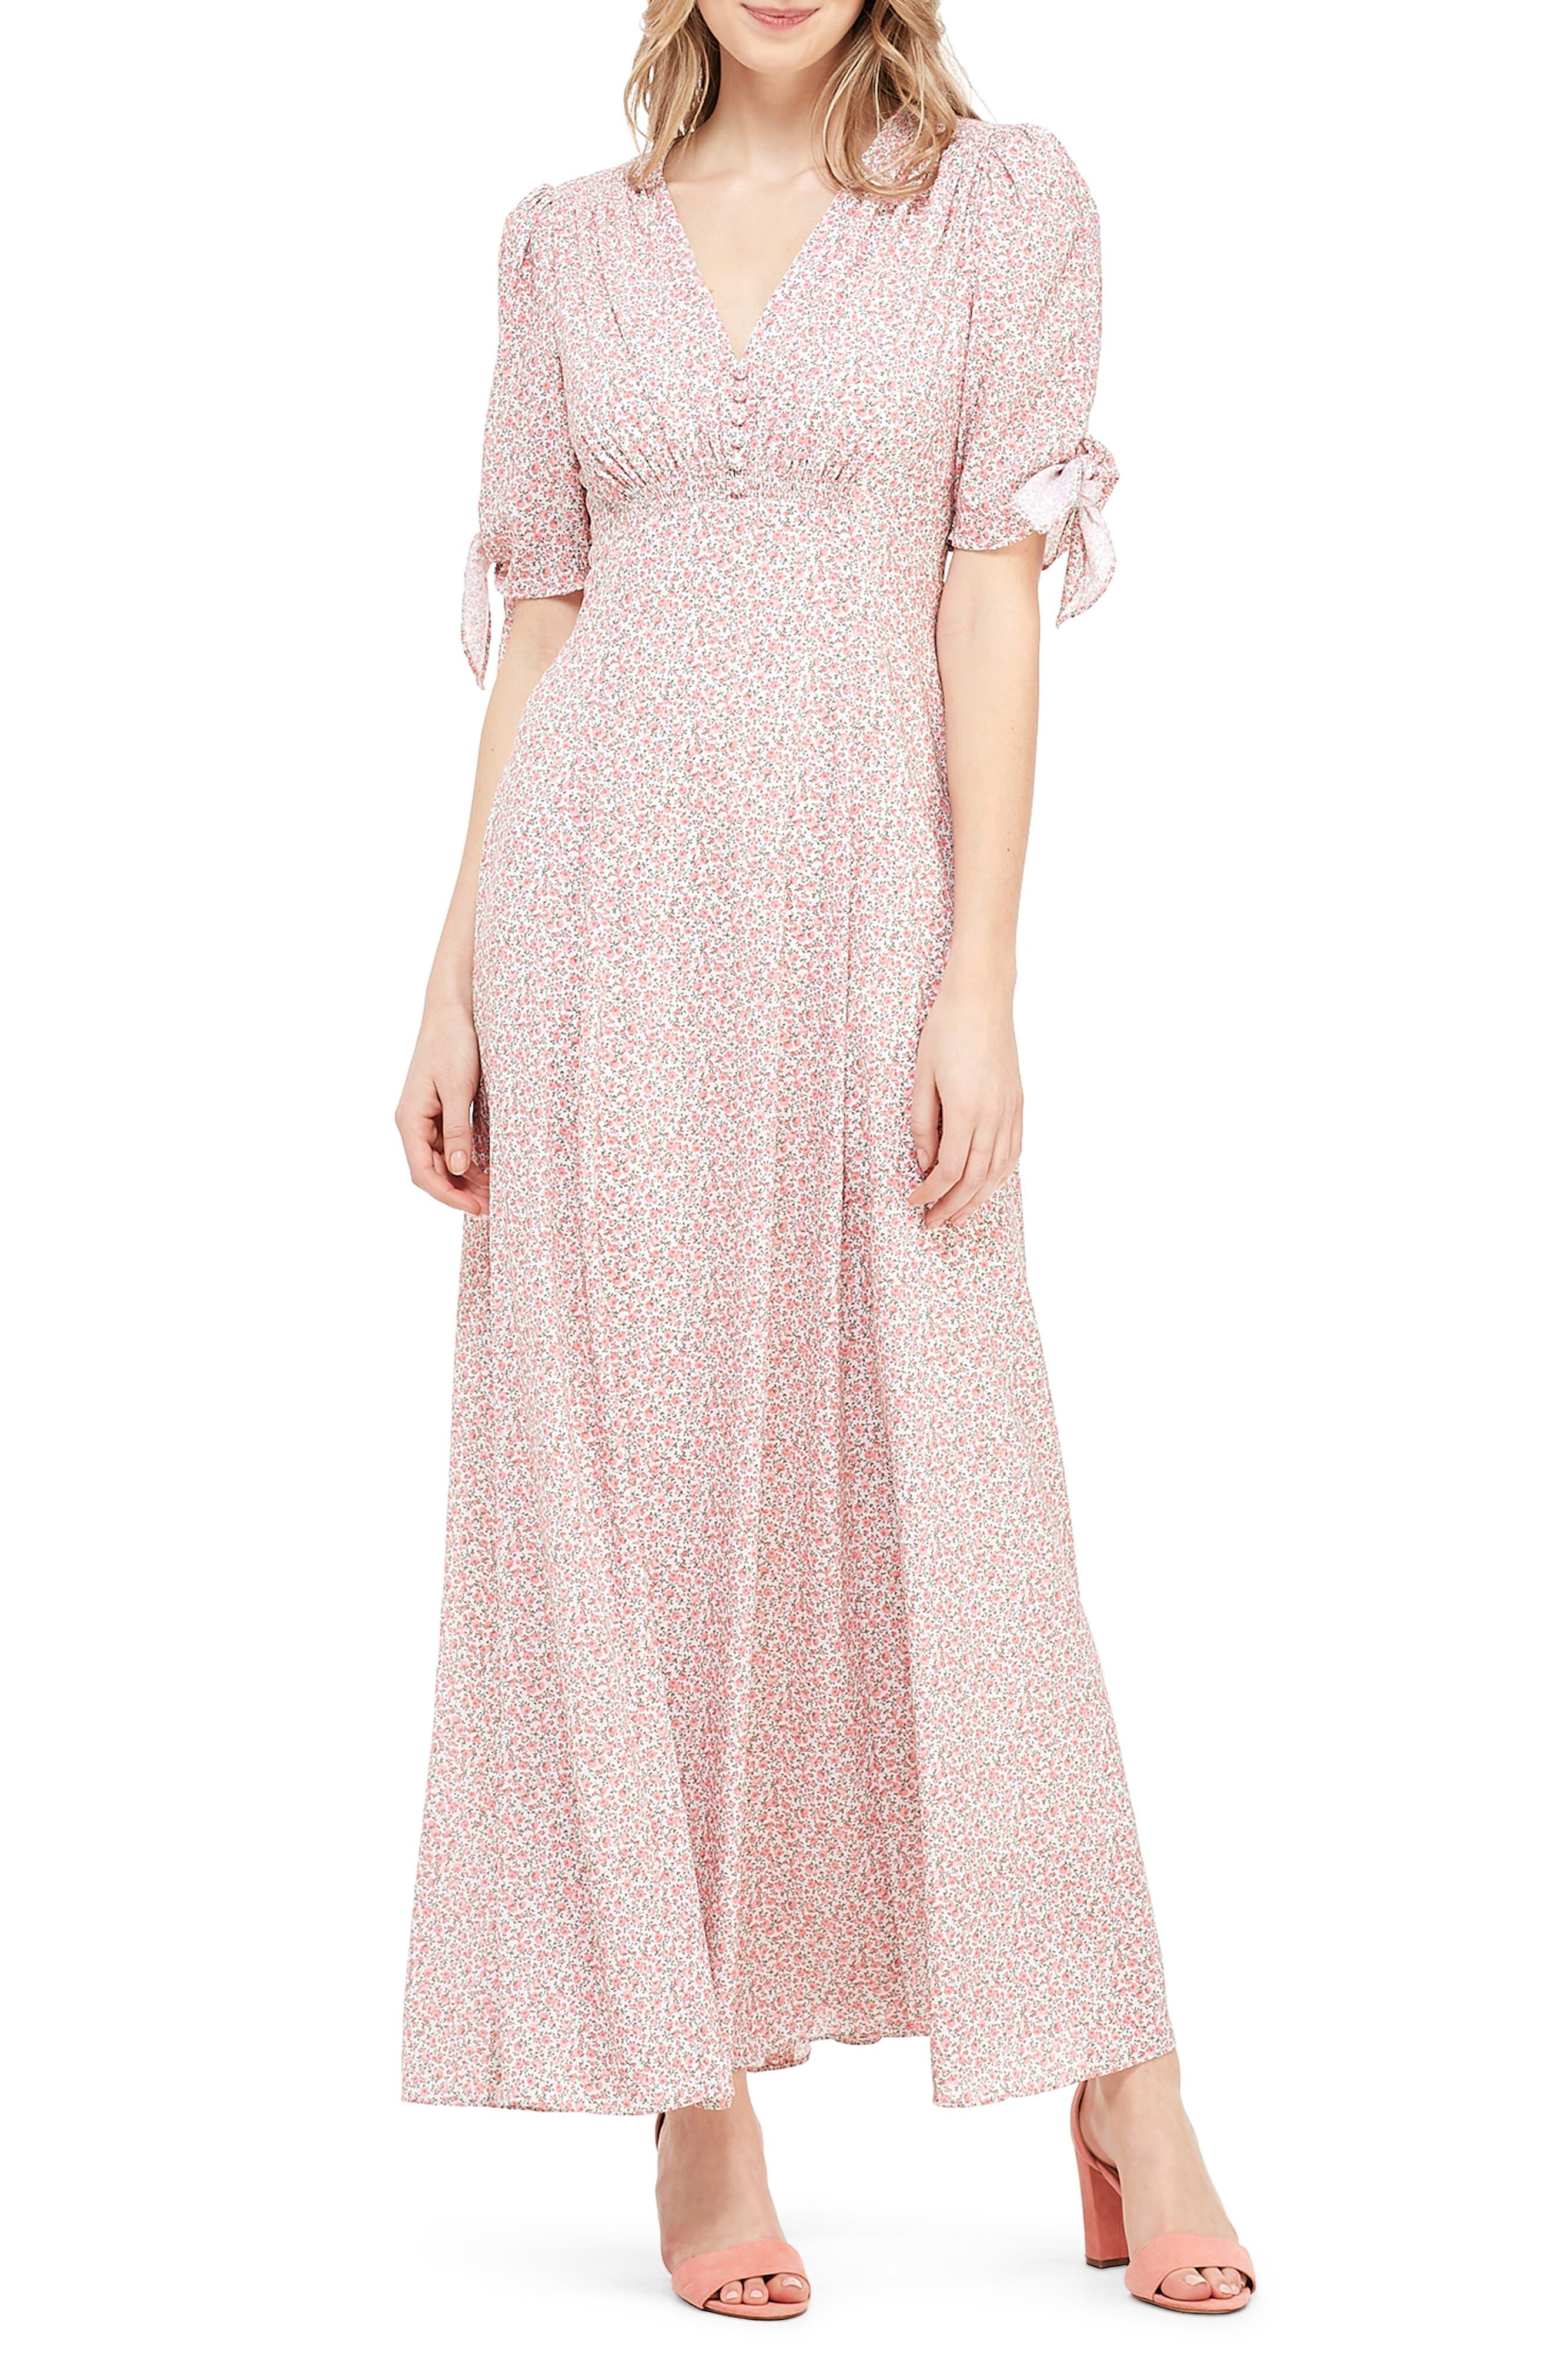 Ditsy Floral Print Maxi Dress, Main, color, PORCELIAN/ PEACH WHISPER